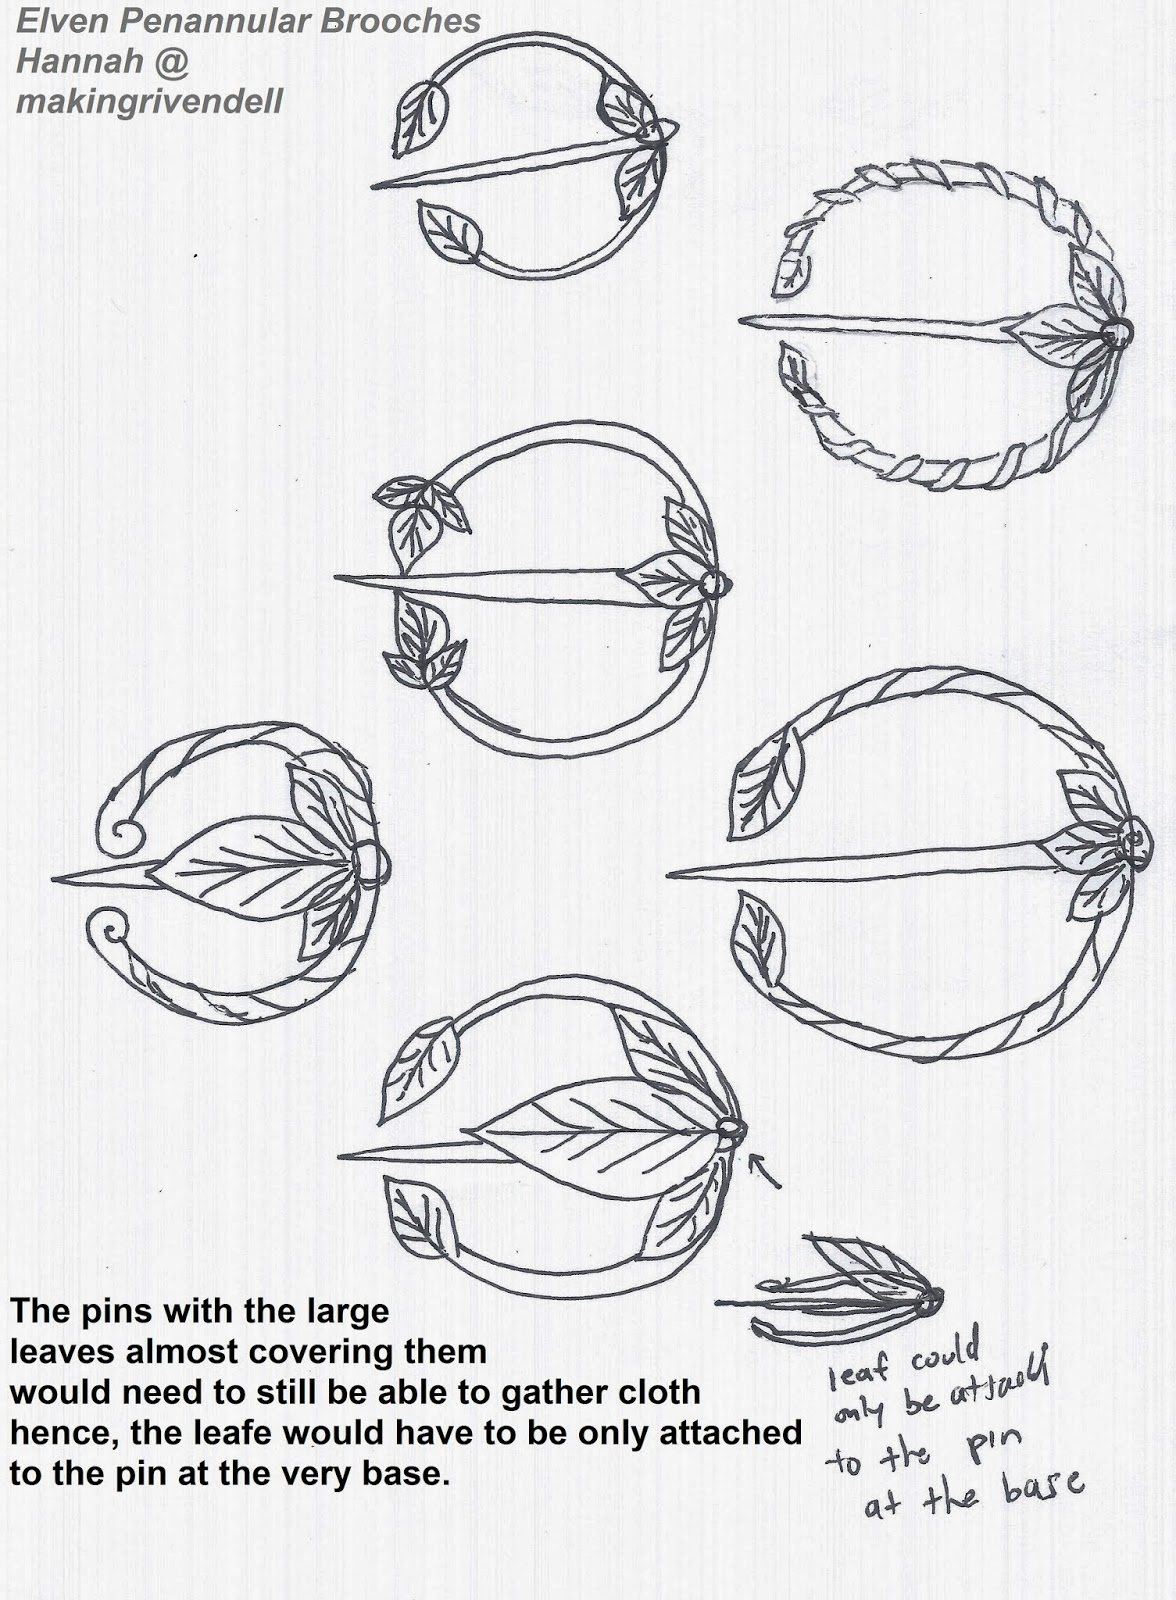 1176x1600 making rivendell in the desert elven penannular brooches designs